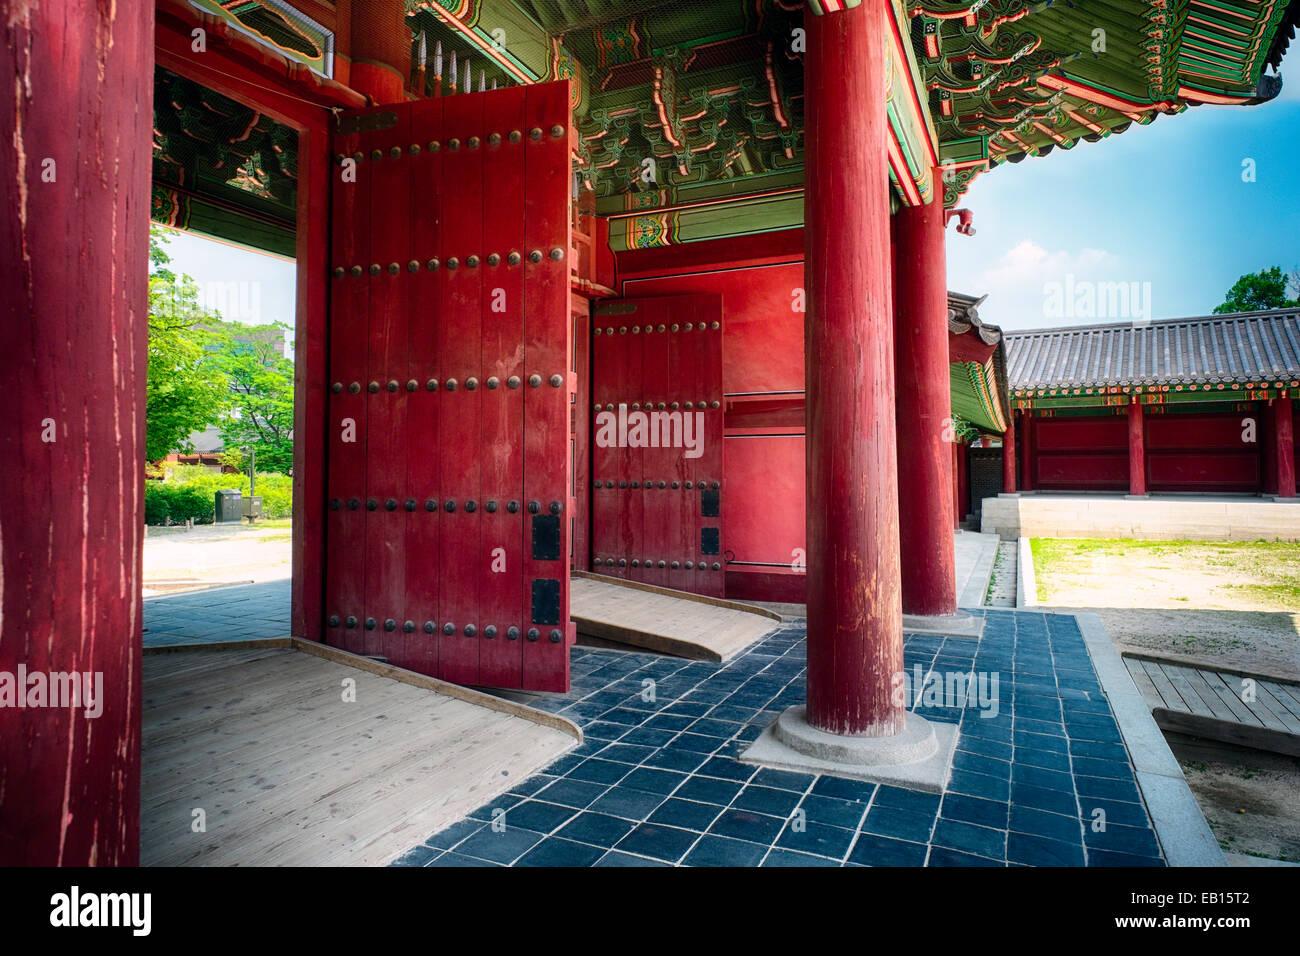 Inner Gates of the Changdeok Palace, Seoul, South Korea - Stock Image